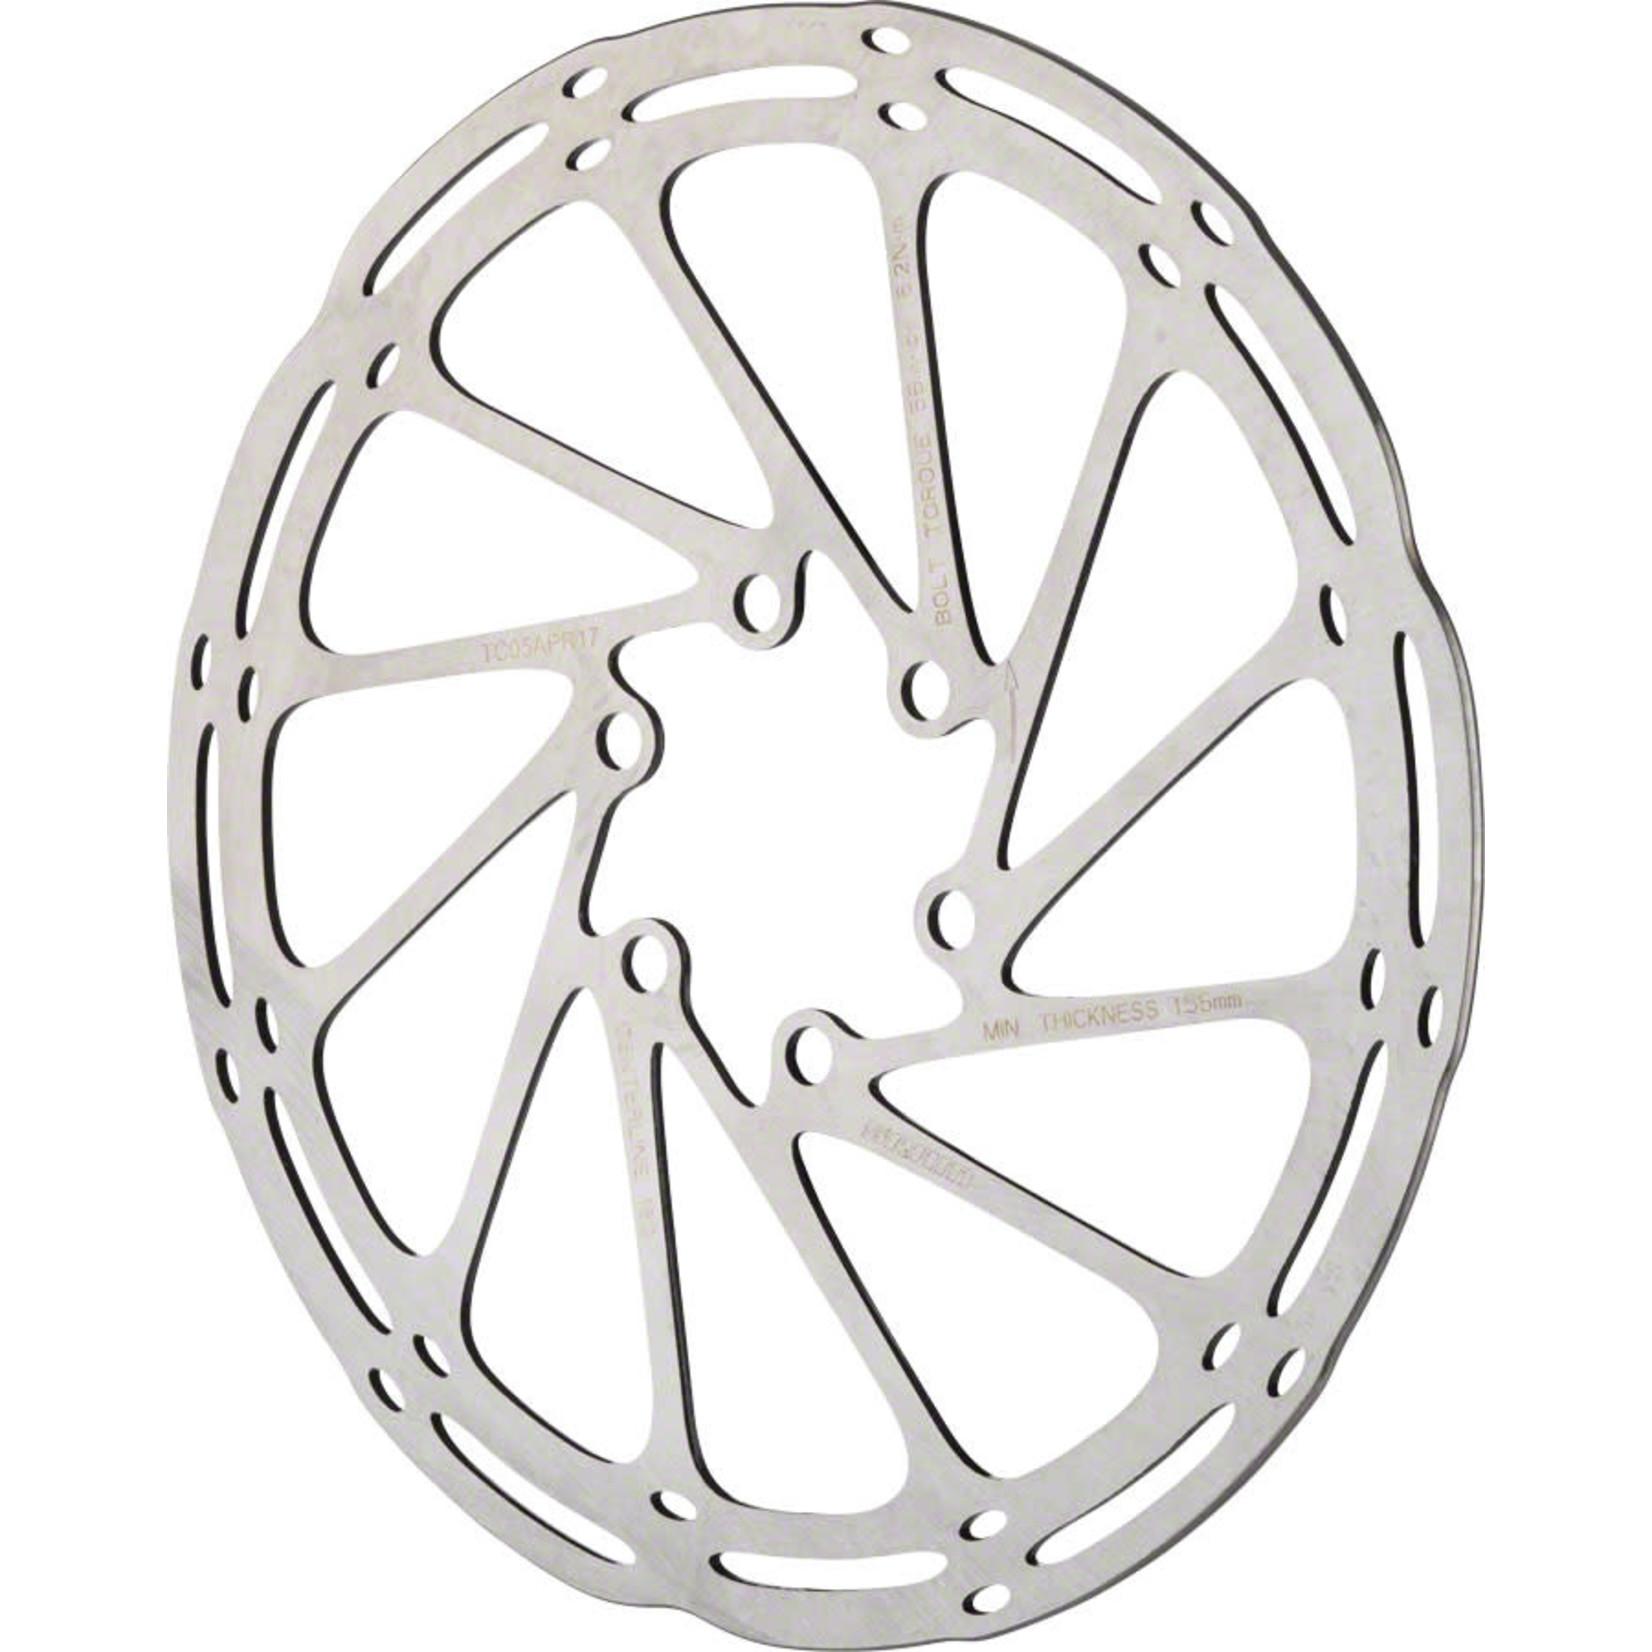 SRAM SRAM CenterLine Disc Brake Rotor - 140mm, 6-Bolt, Silver